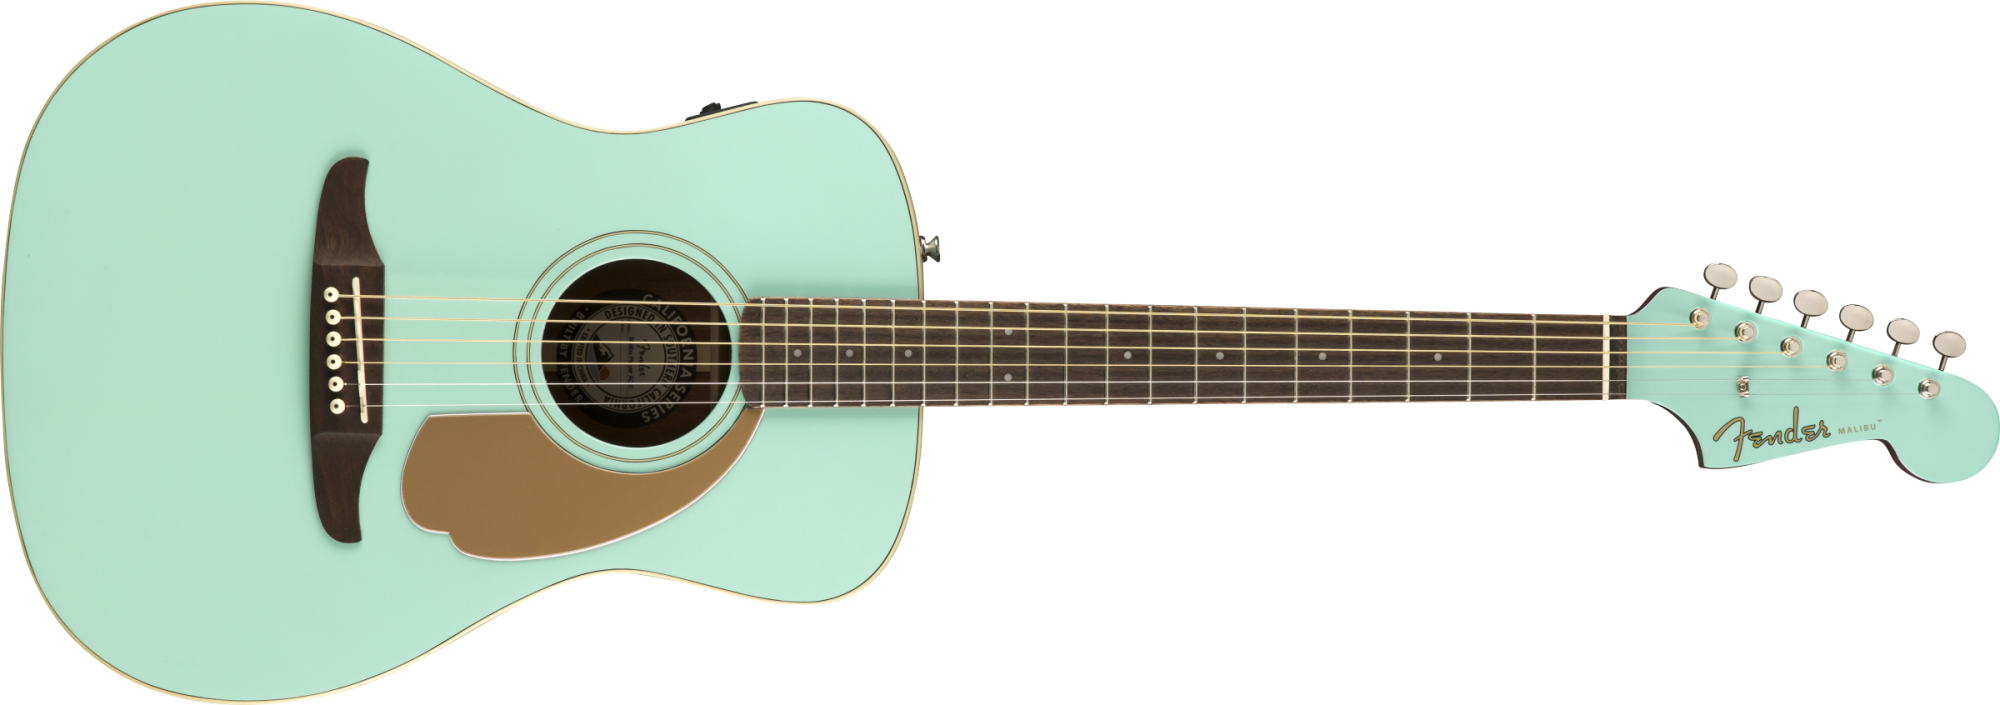 Fender Malibu Player, Walnut Fingerboard, Aqua Splash